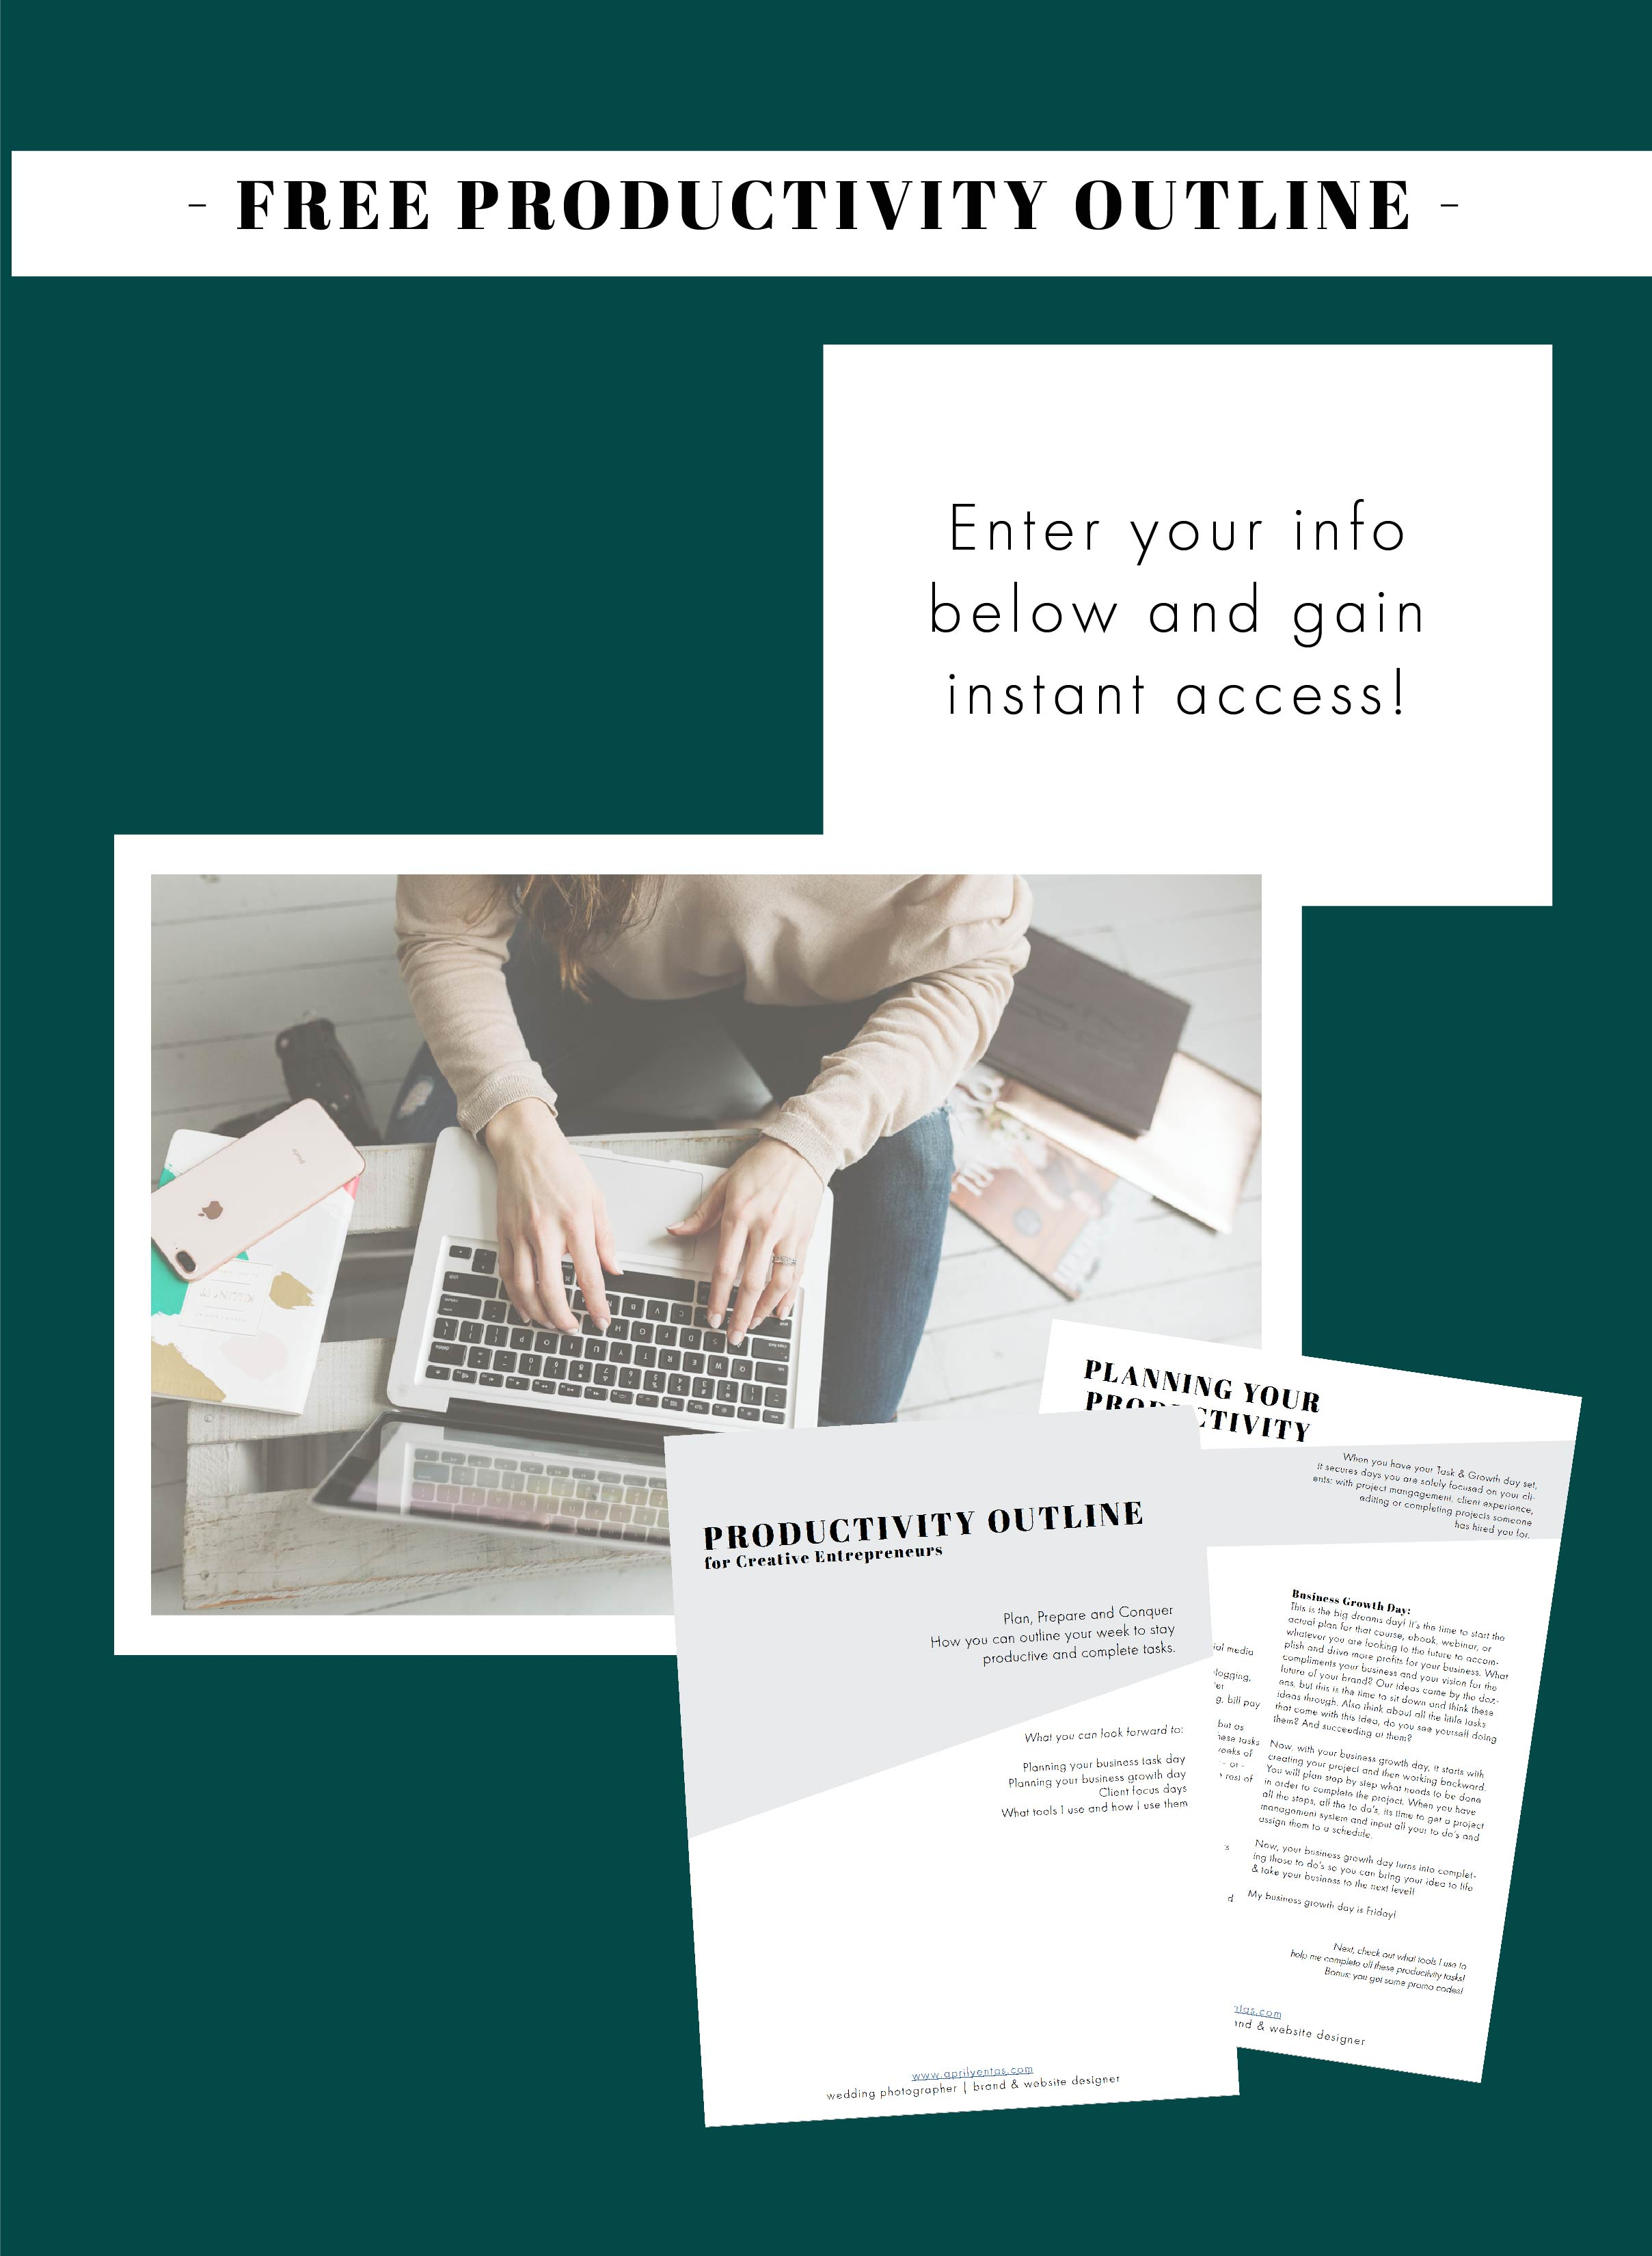 productivity outline freebie   tips for entrepreneurs